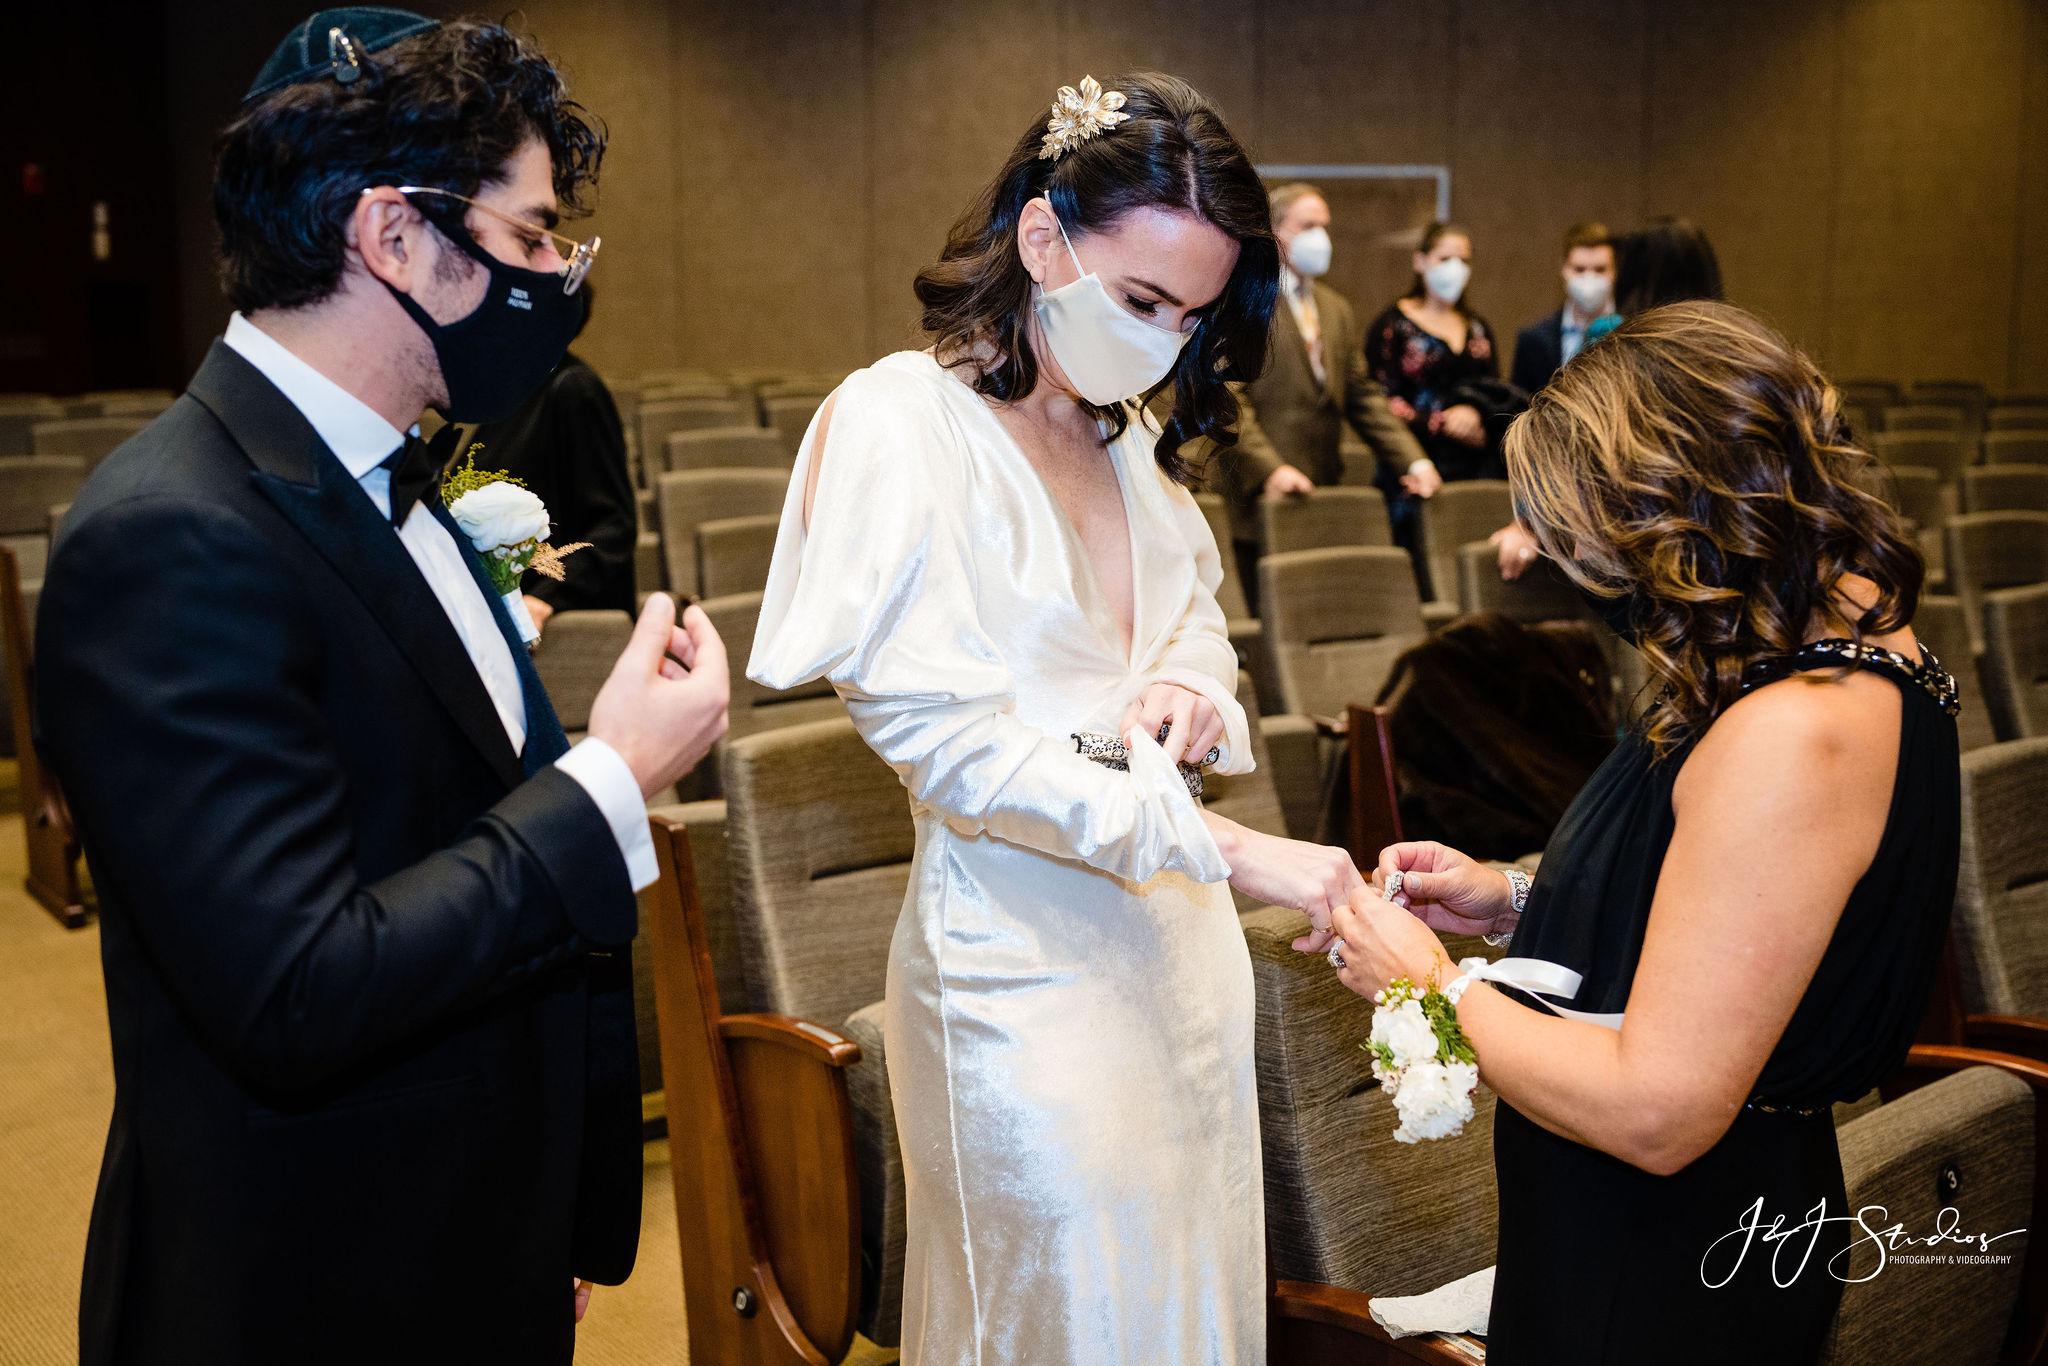 Ring put on bride Jewish practice